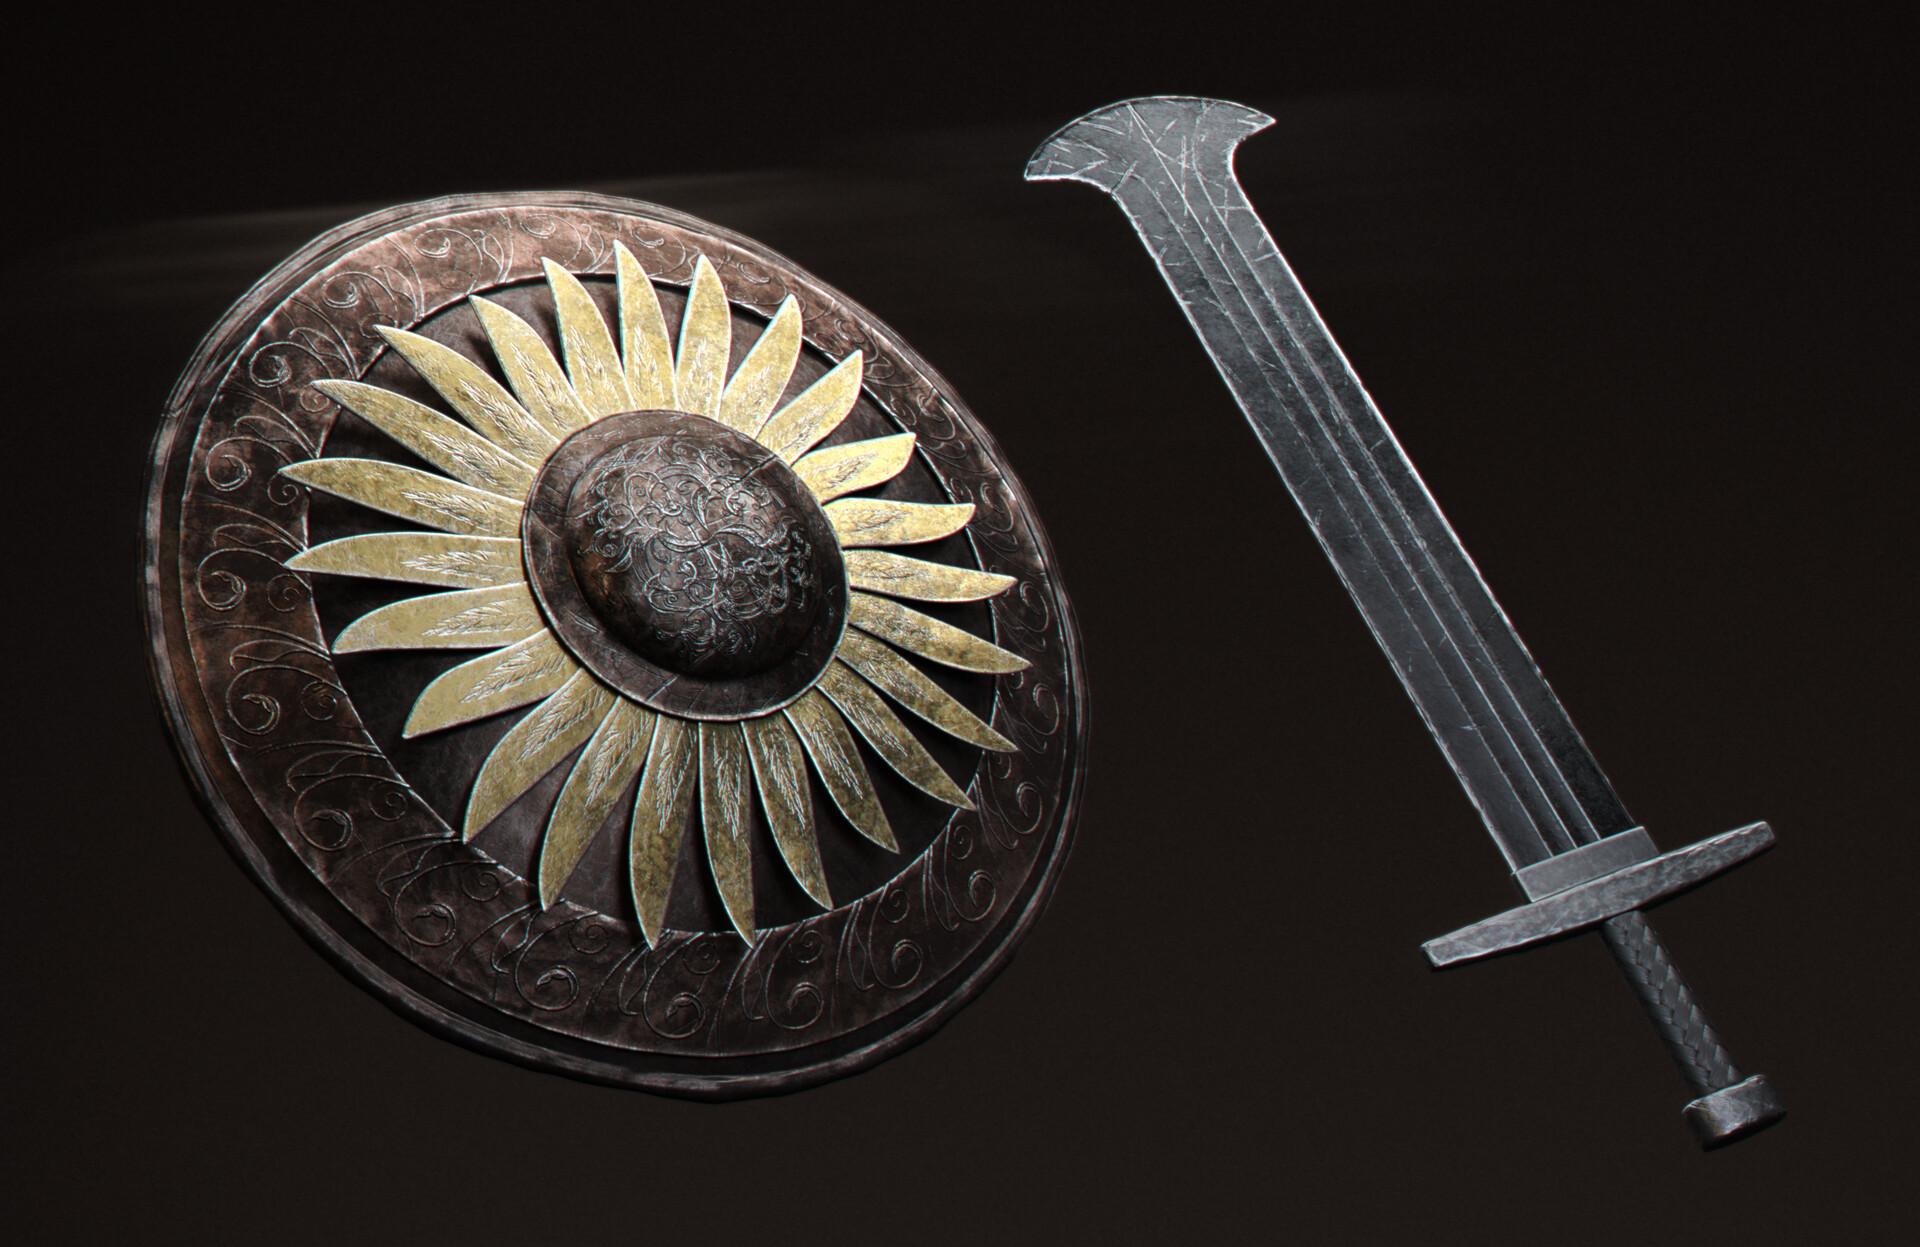 Alec hunstx weapons